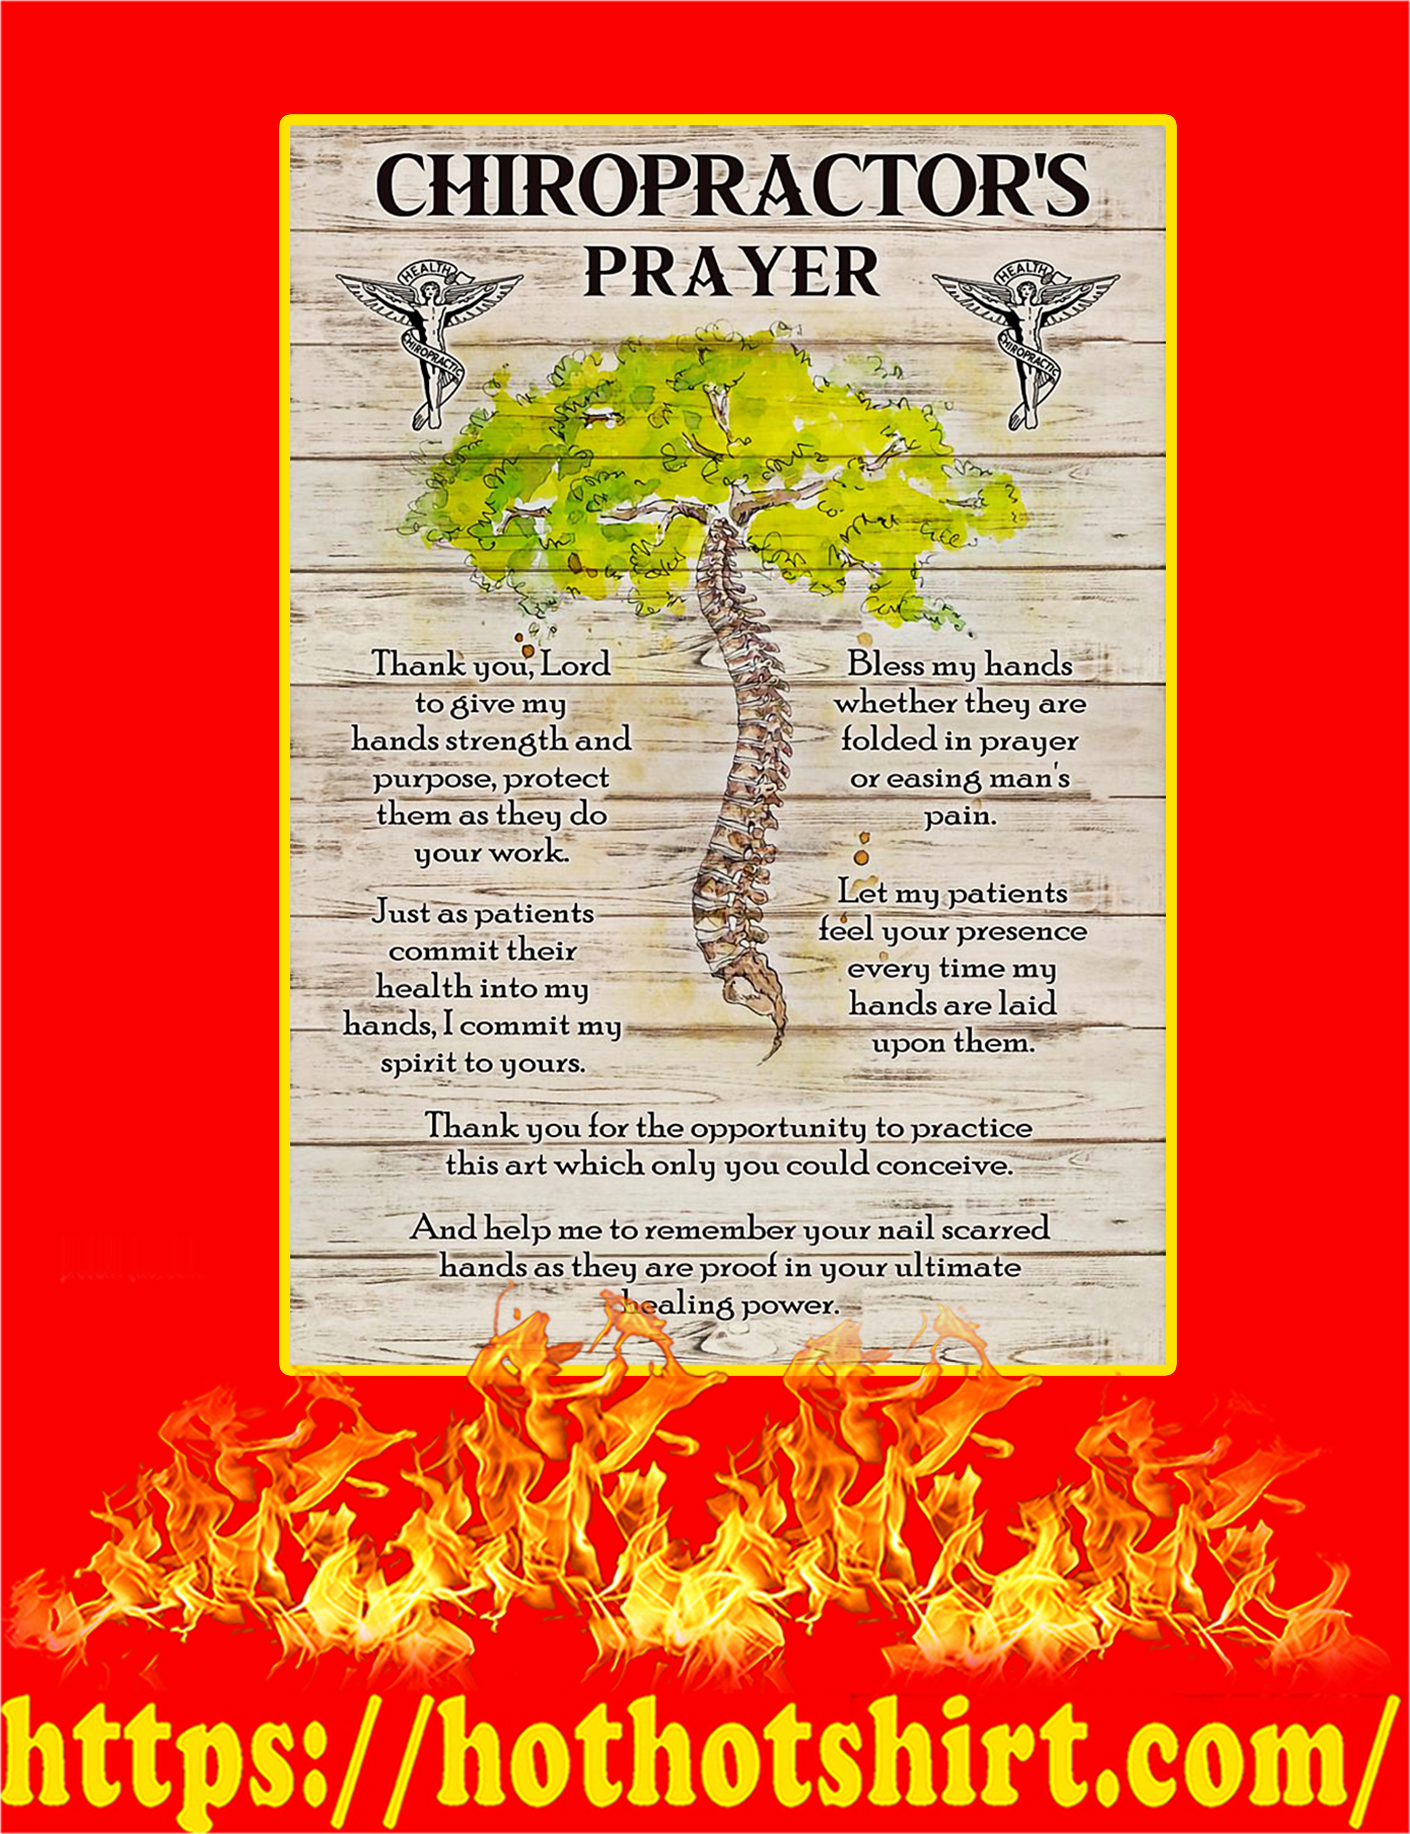 Chiropractor' Prayer Poster - A4